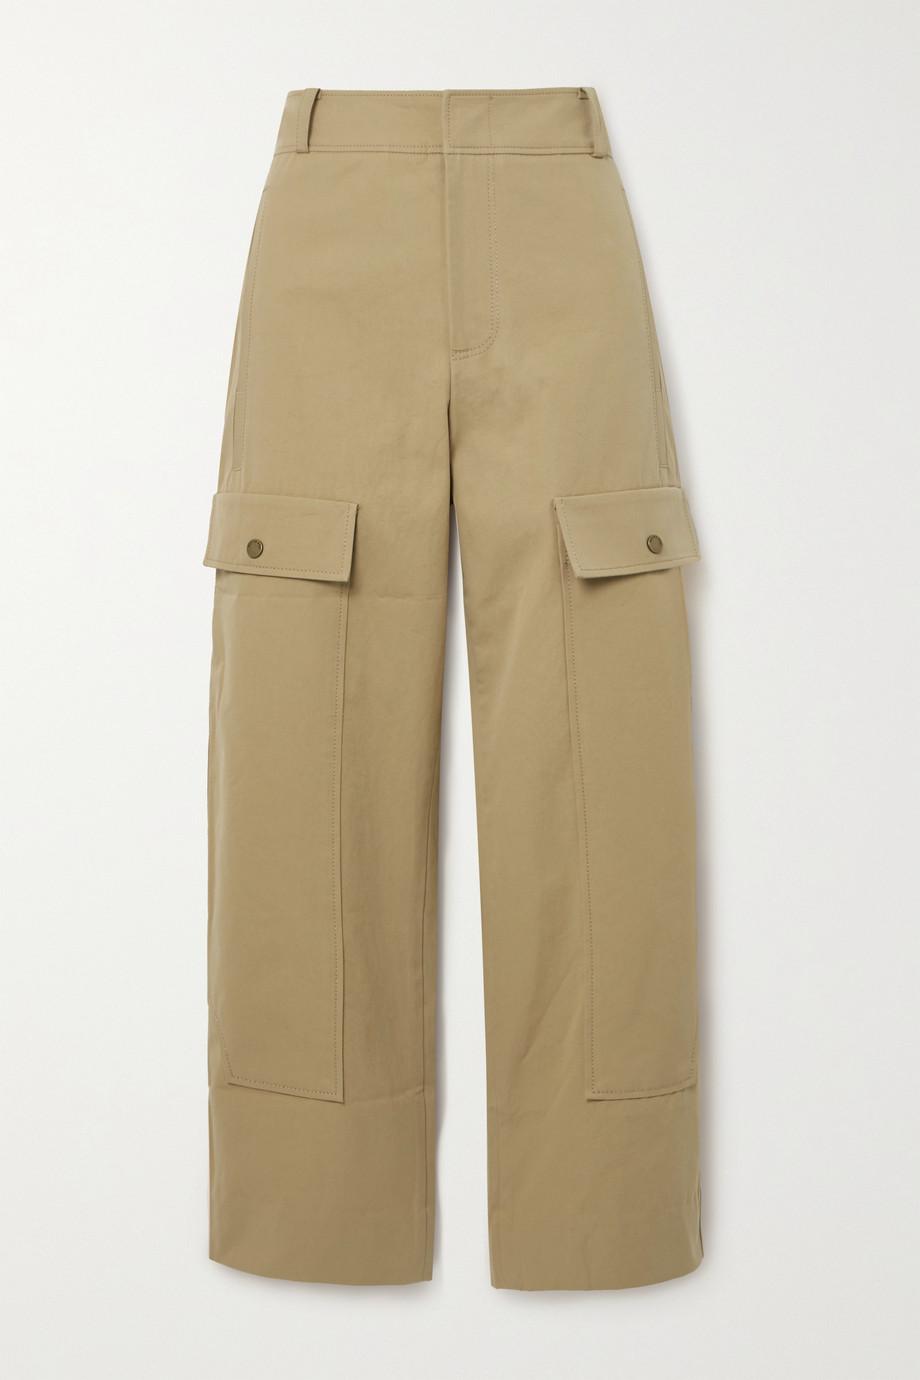 REJINA PYO Pantalon treillis droit en toile de coton Peggy